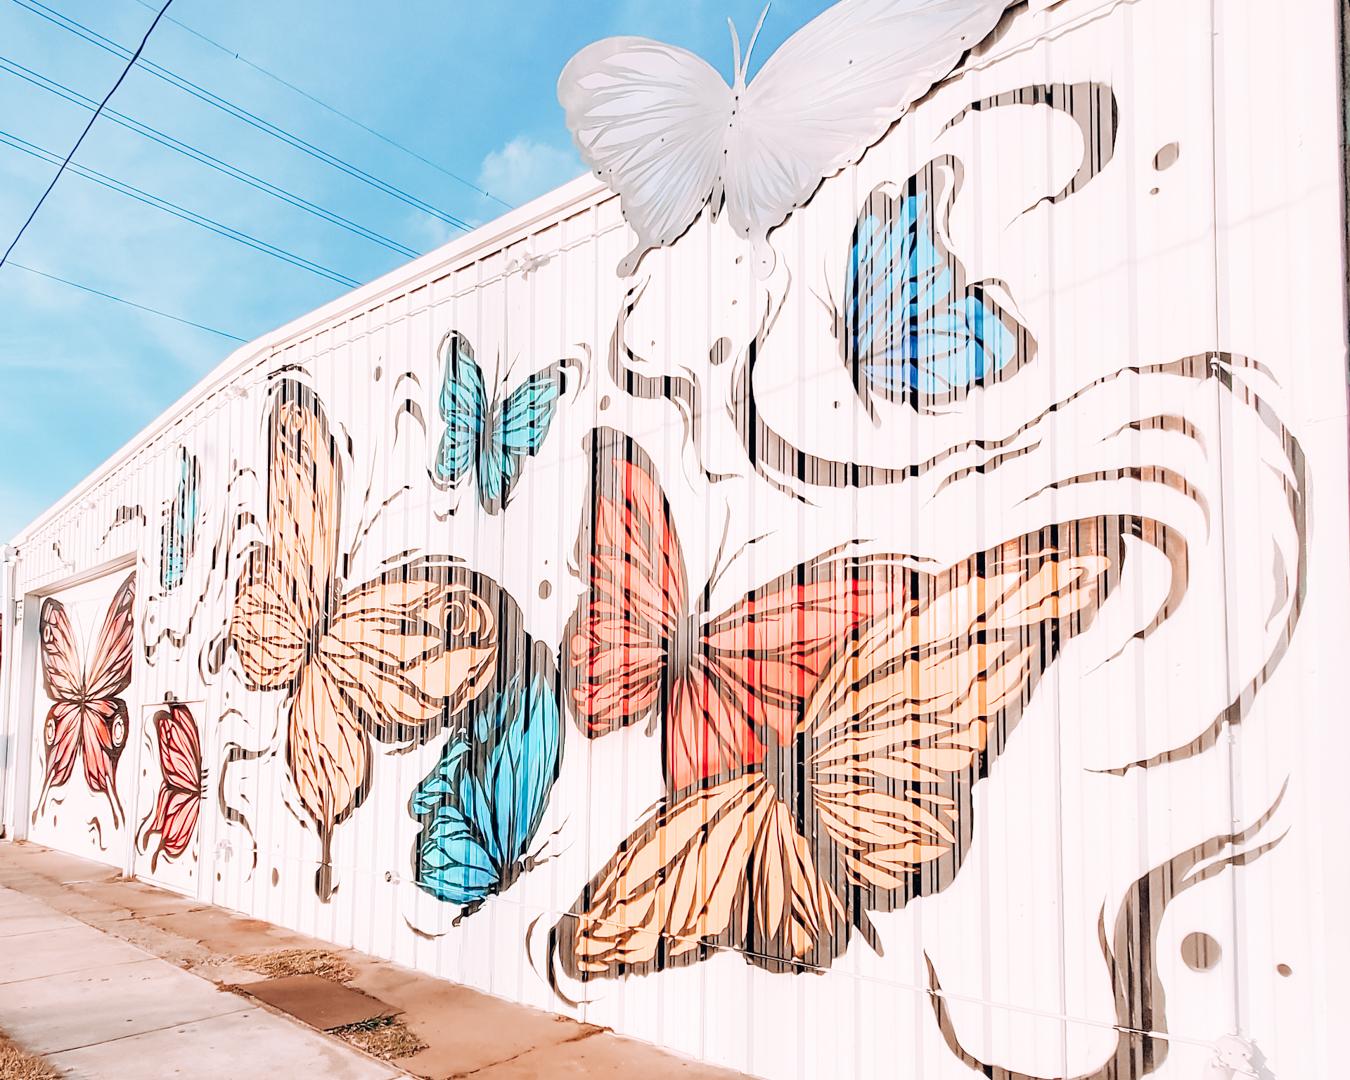 Mural in Houston